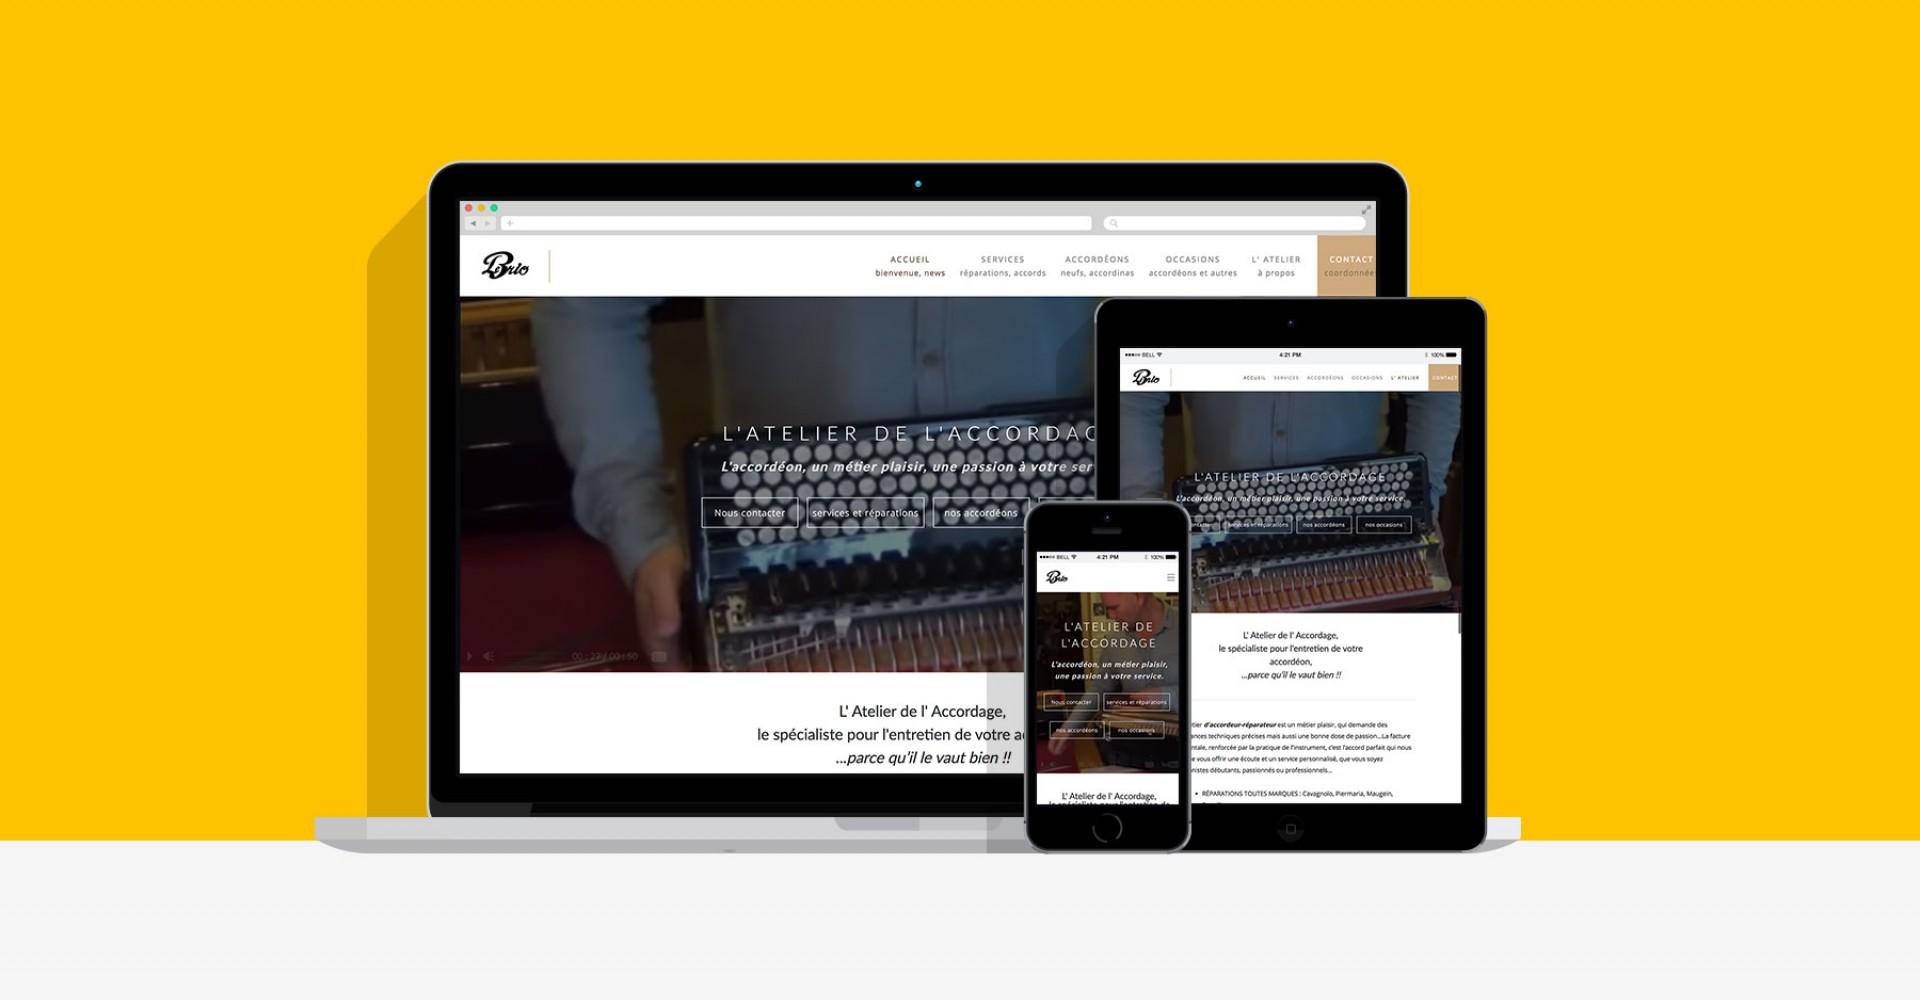 7ec00a0c5b679 Atelier de l'accordage · Antoine de Labriolle